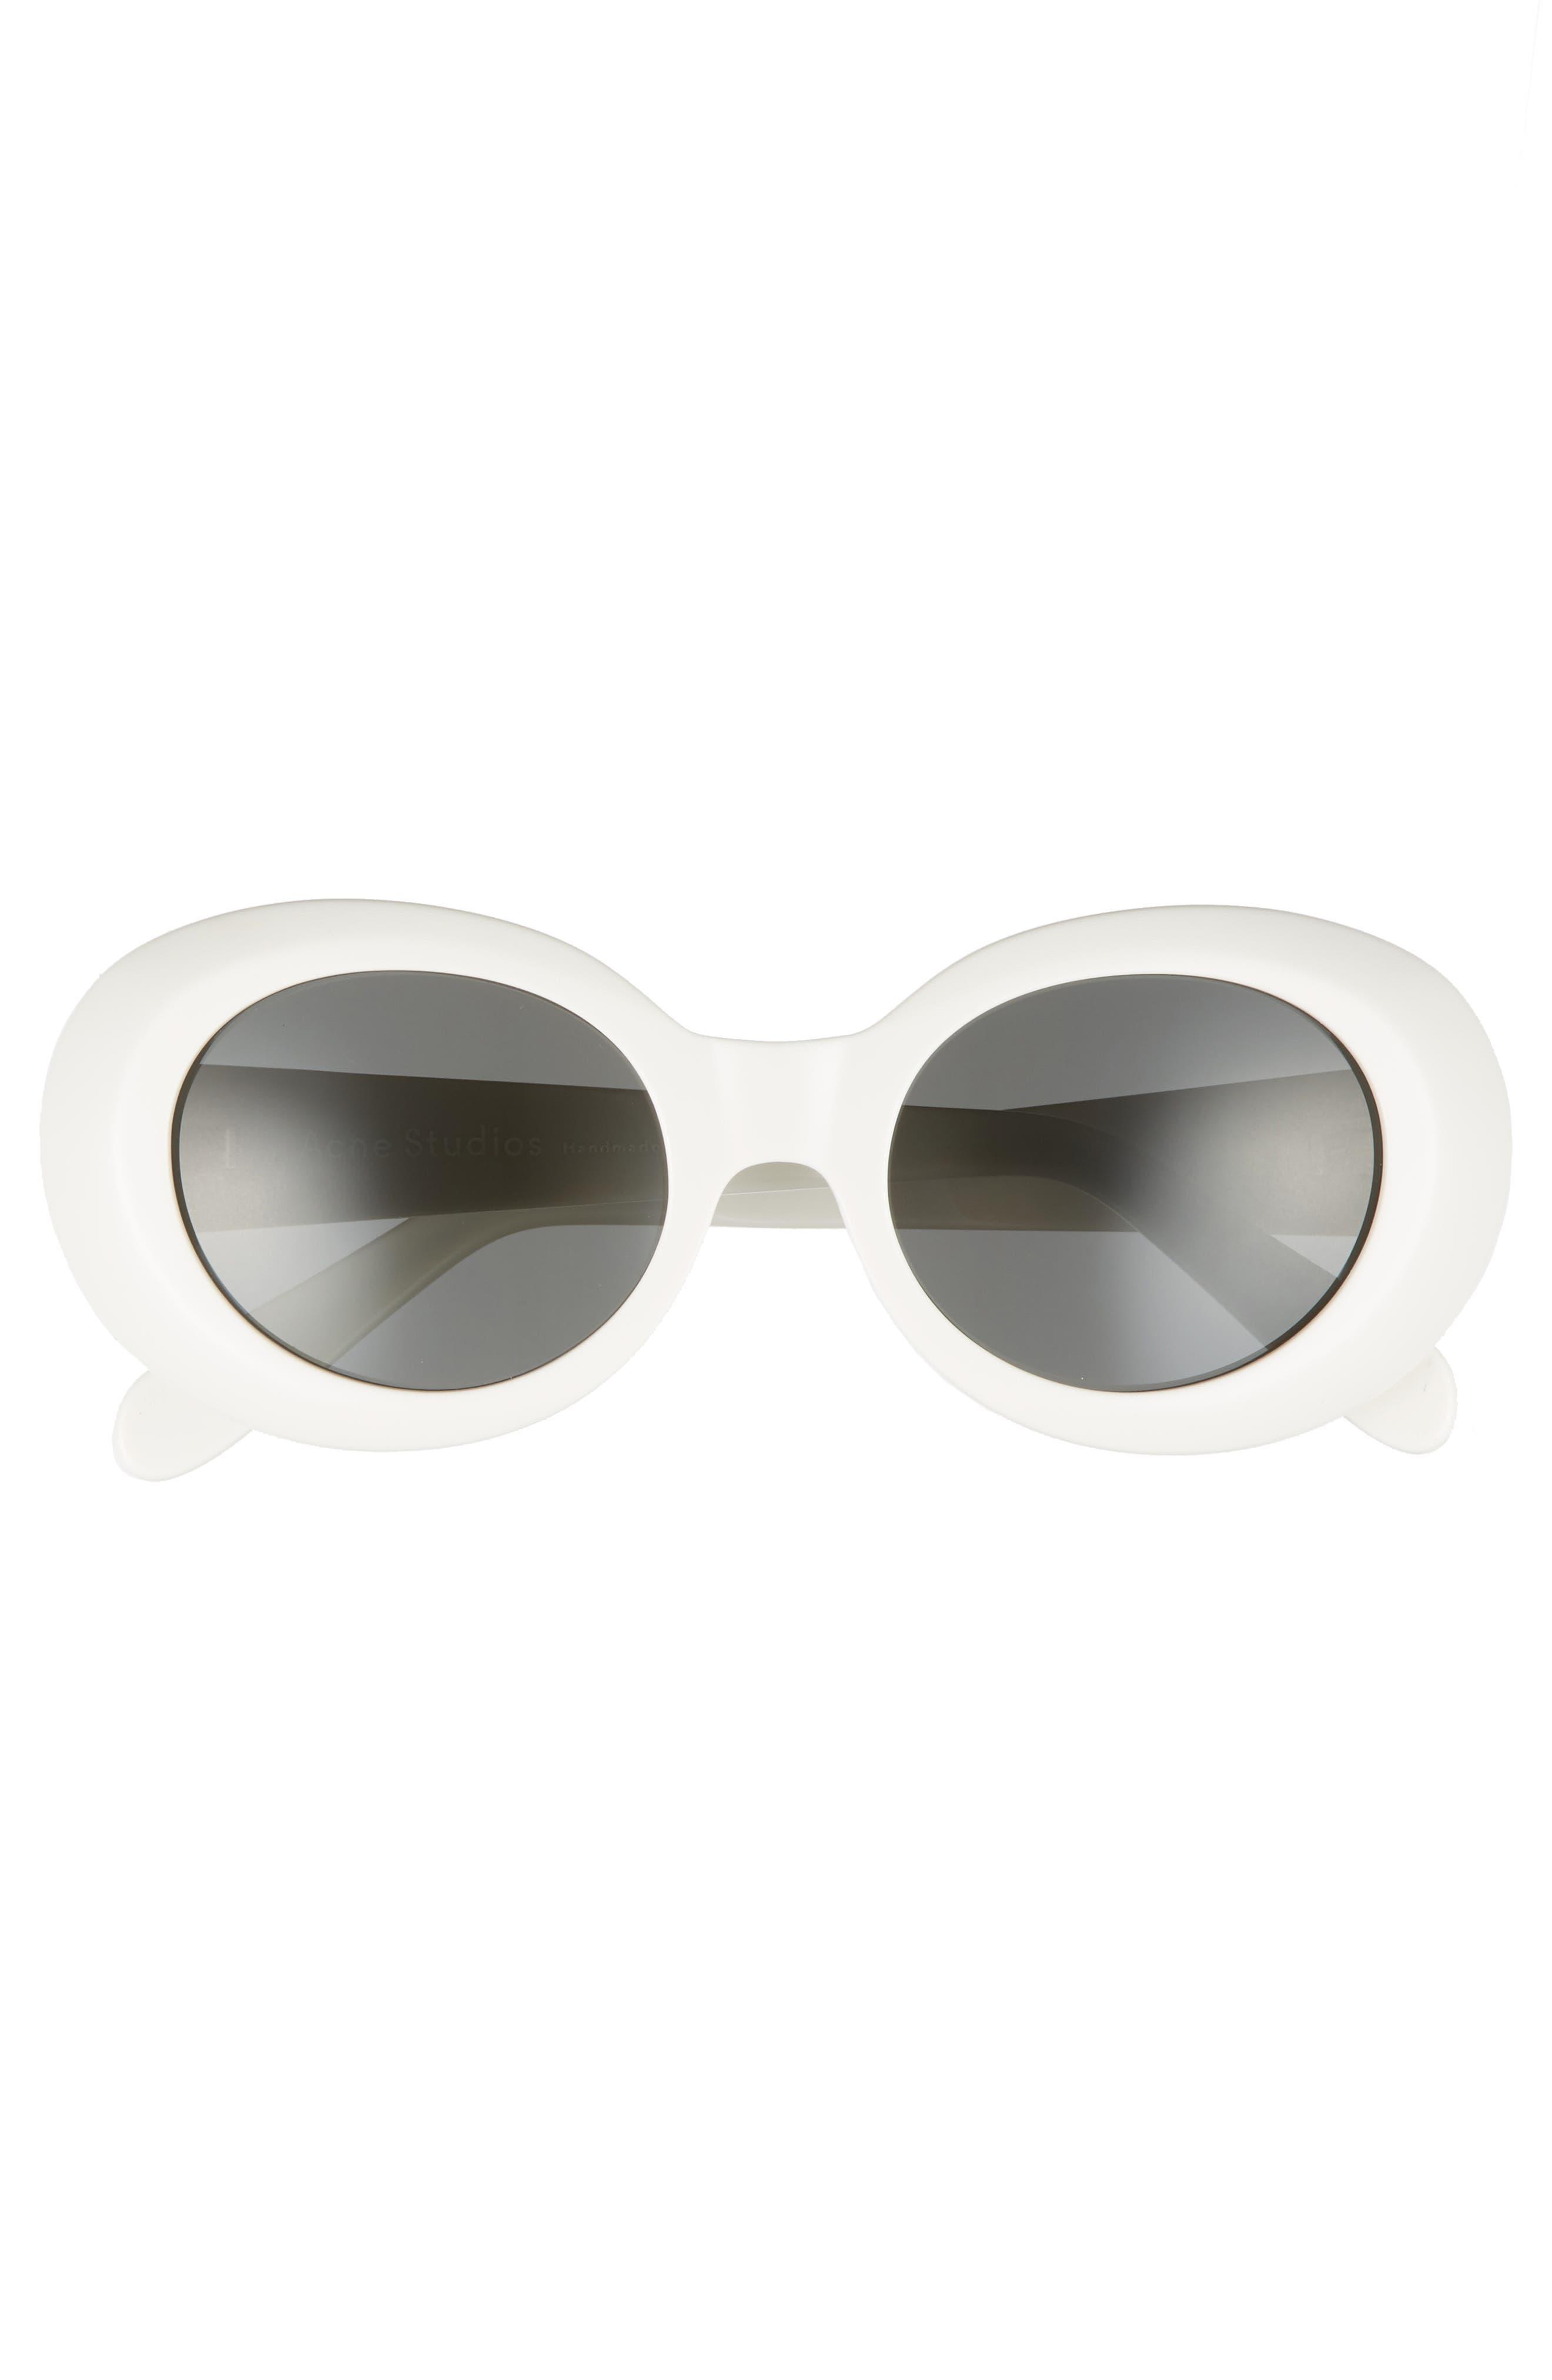 Mustang 48mm Sunglasses,                             Alternate thumbnail 3, color,                             Off White/ Black